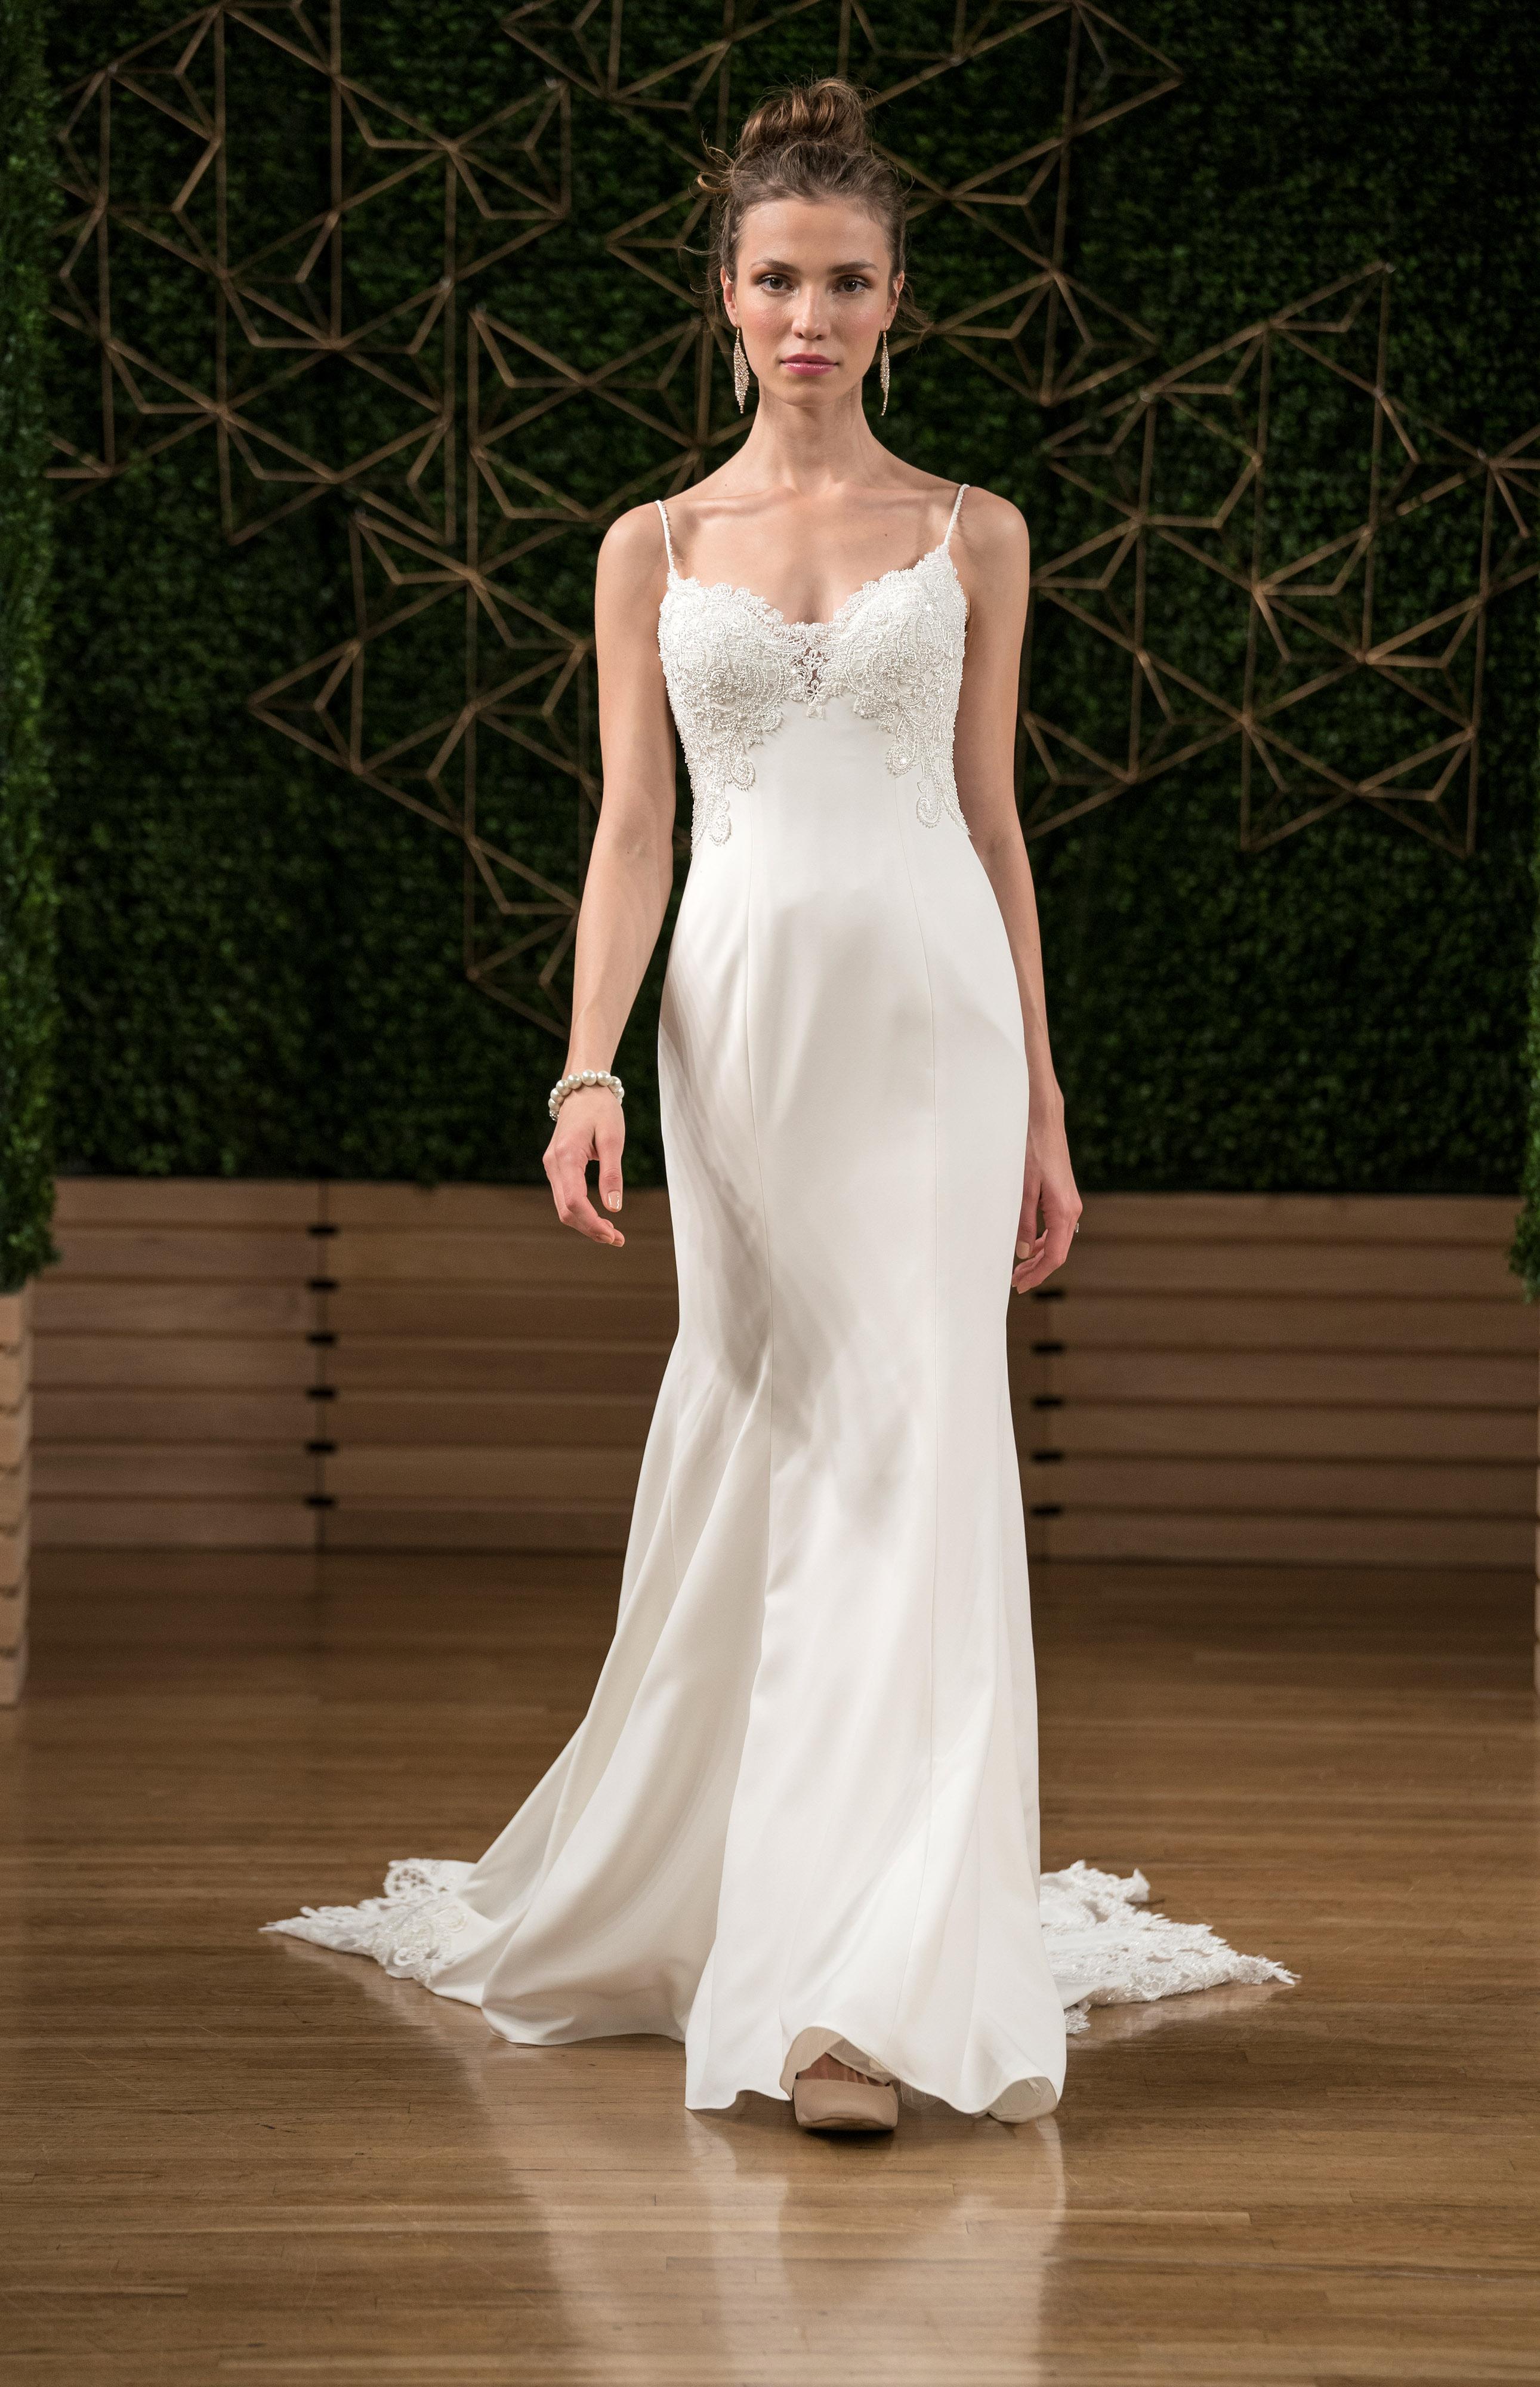 maggie sottero wedding dress fall 2018 spaghetti strap embellished sheath